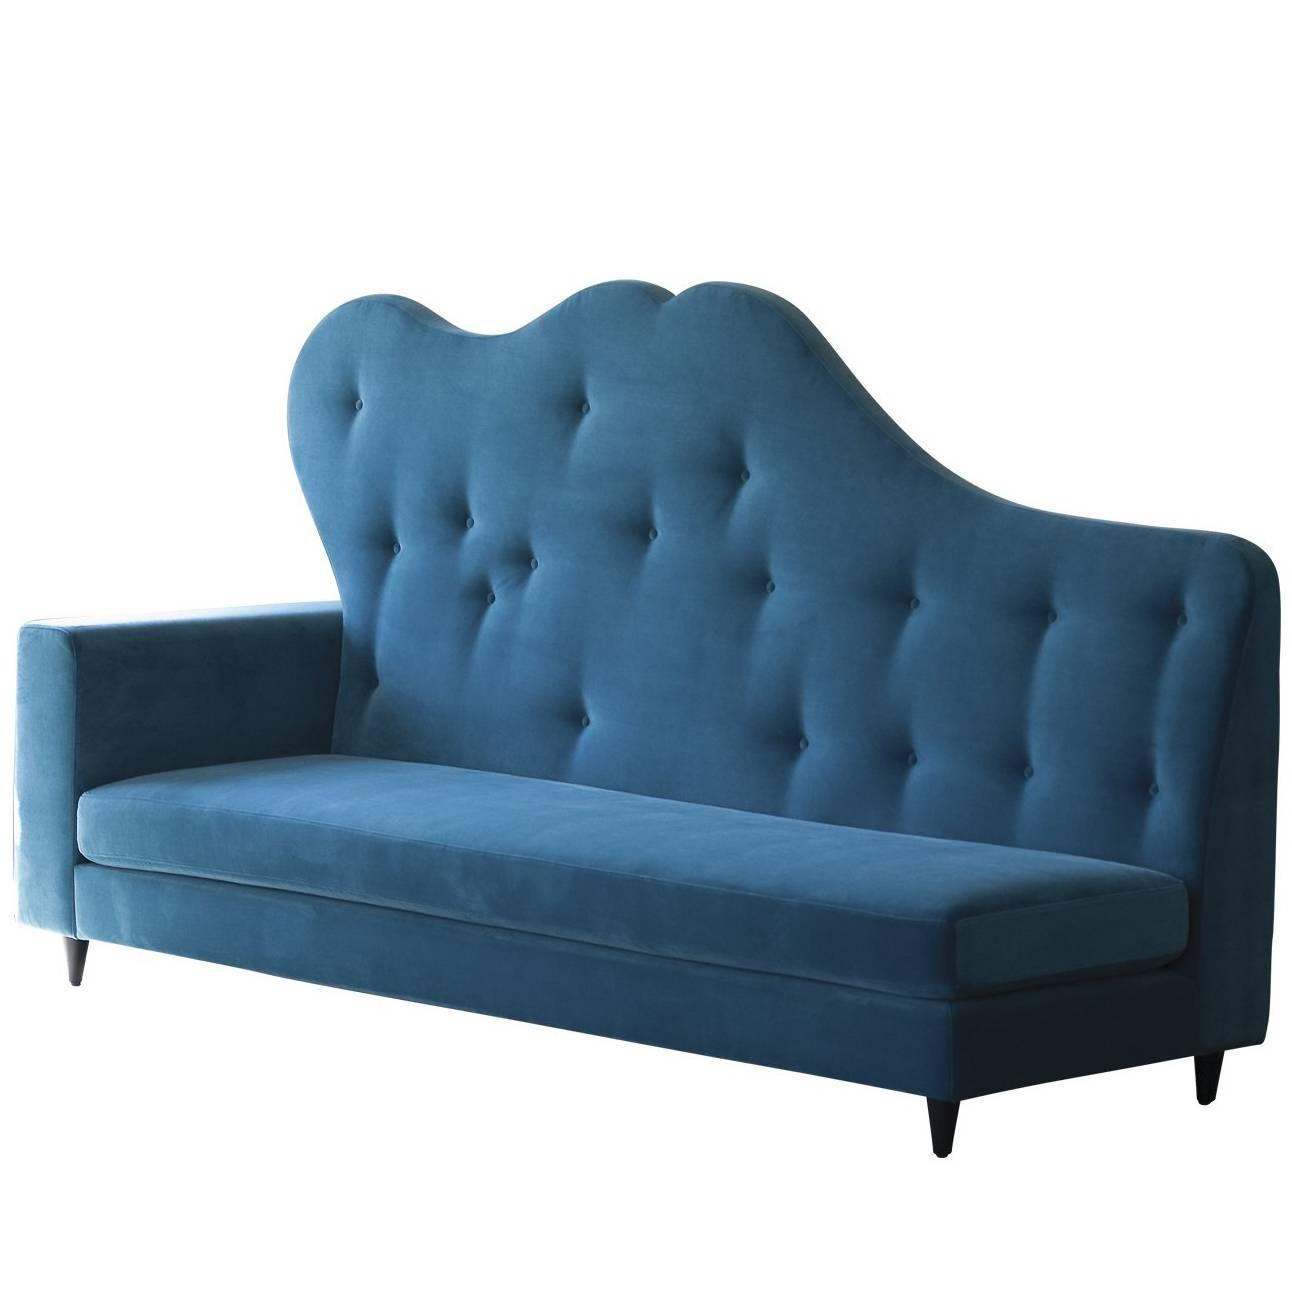 1940 s french salon sofa with original fringe upholstery at 1stdibs rh 1stdibs com beauty salon furniture sofa Small Sofa